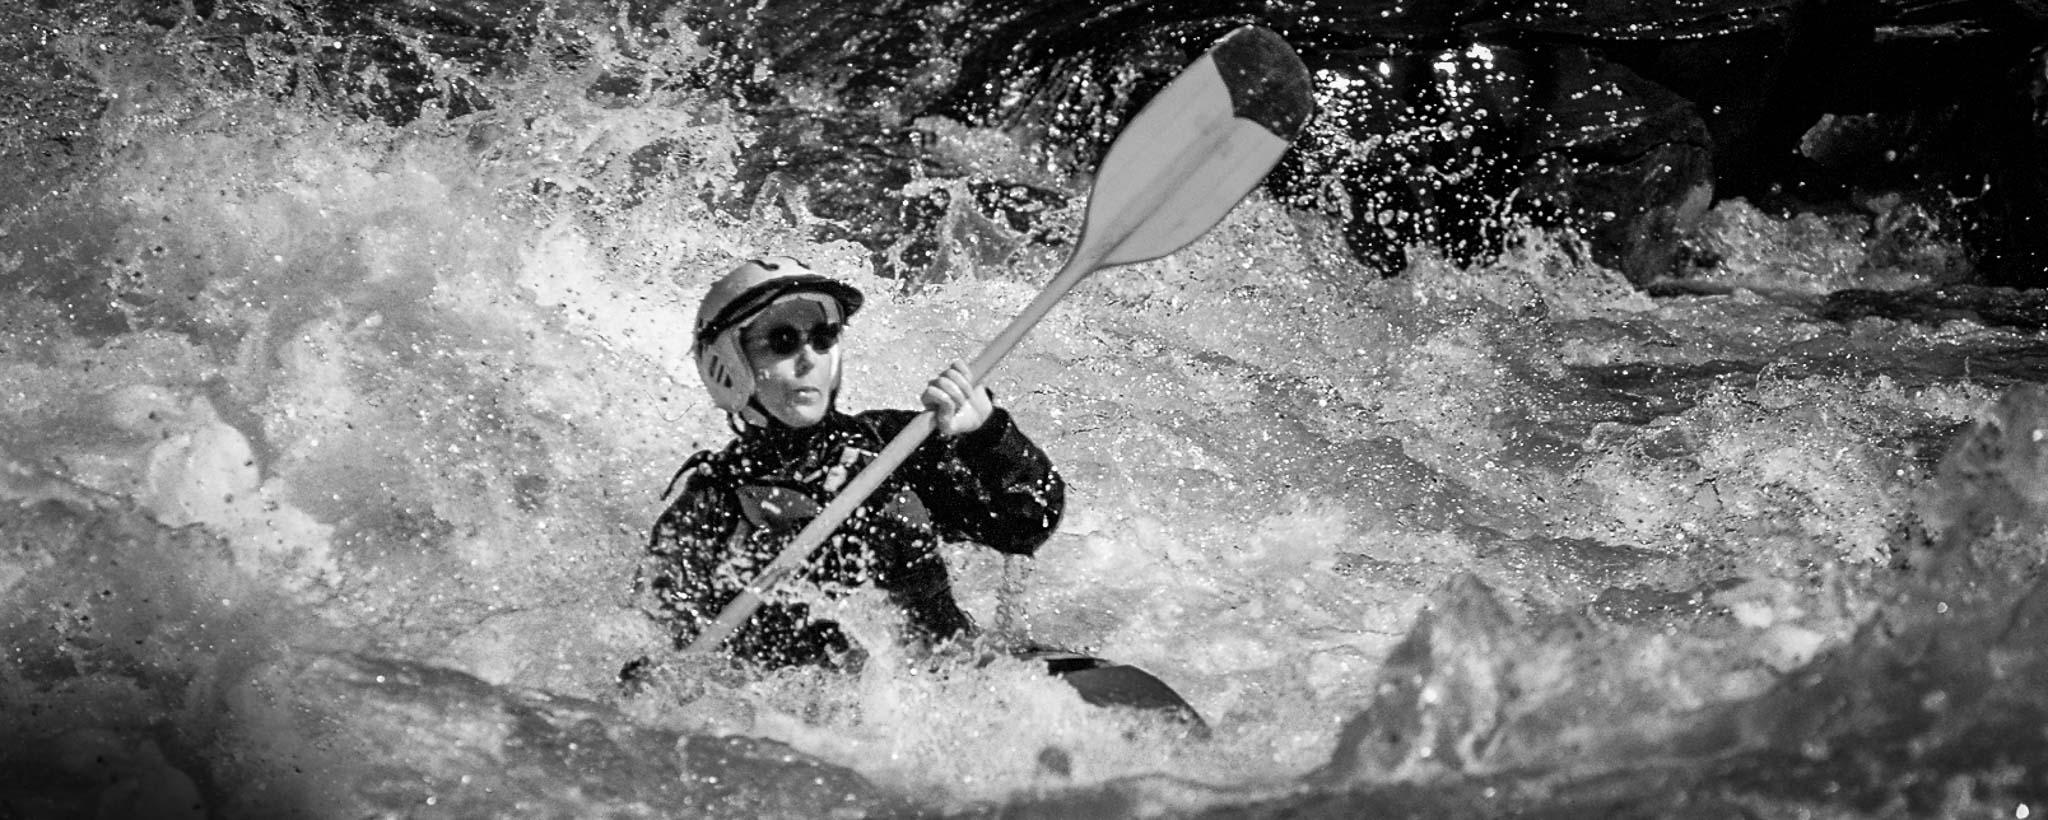 Olympic kayaker